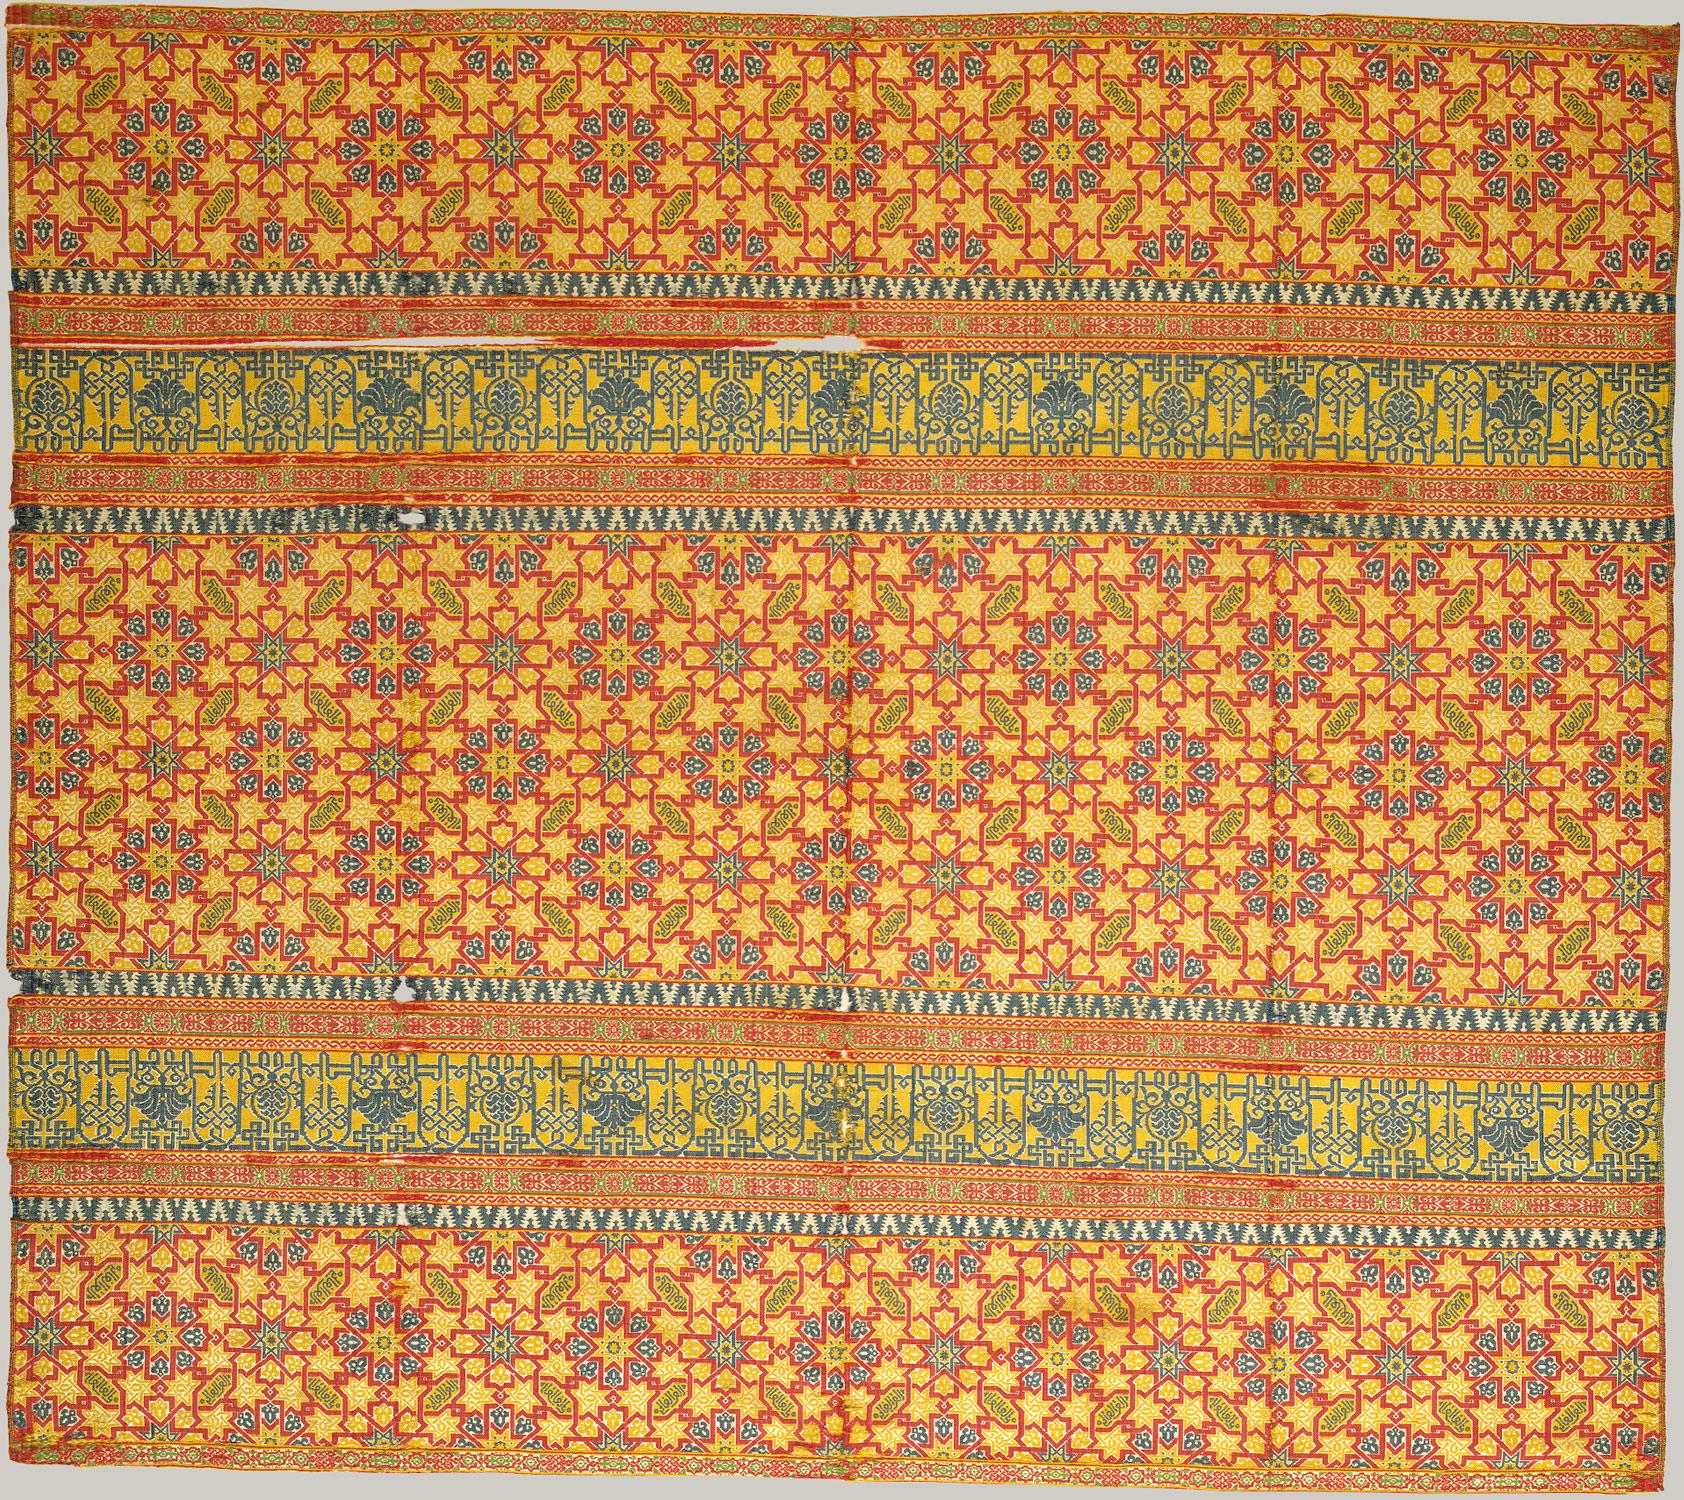 African Decorative Art